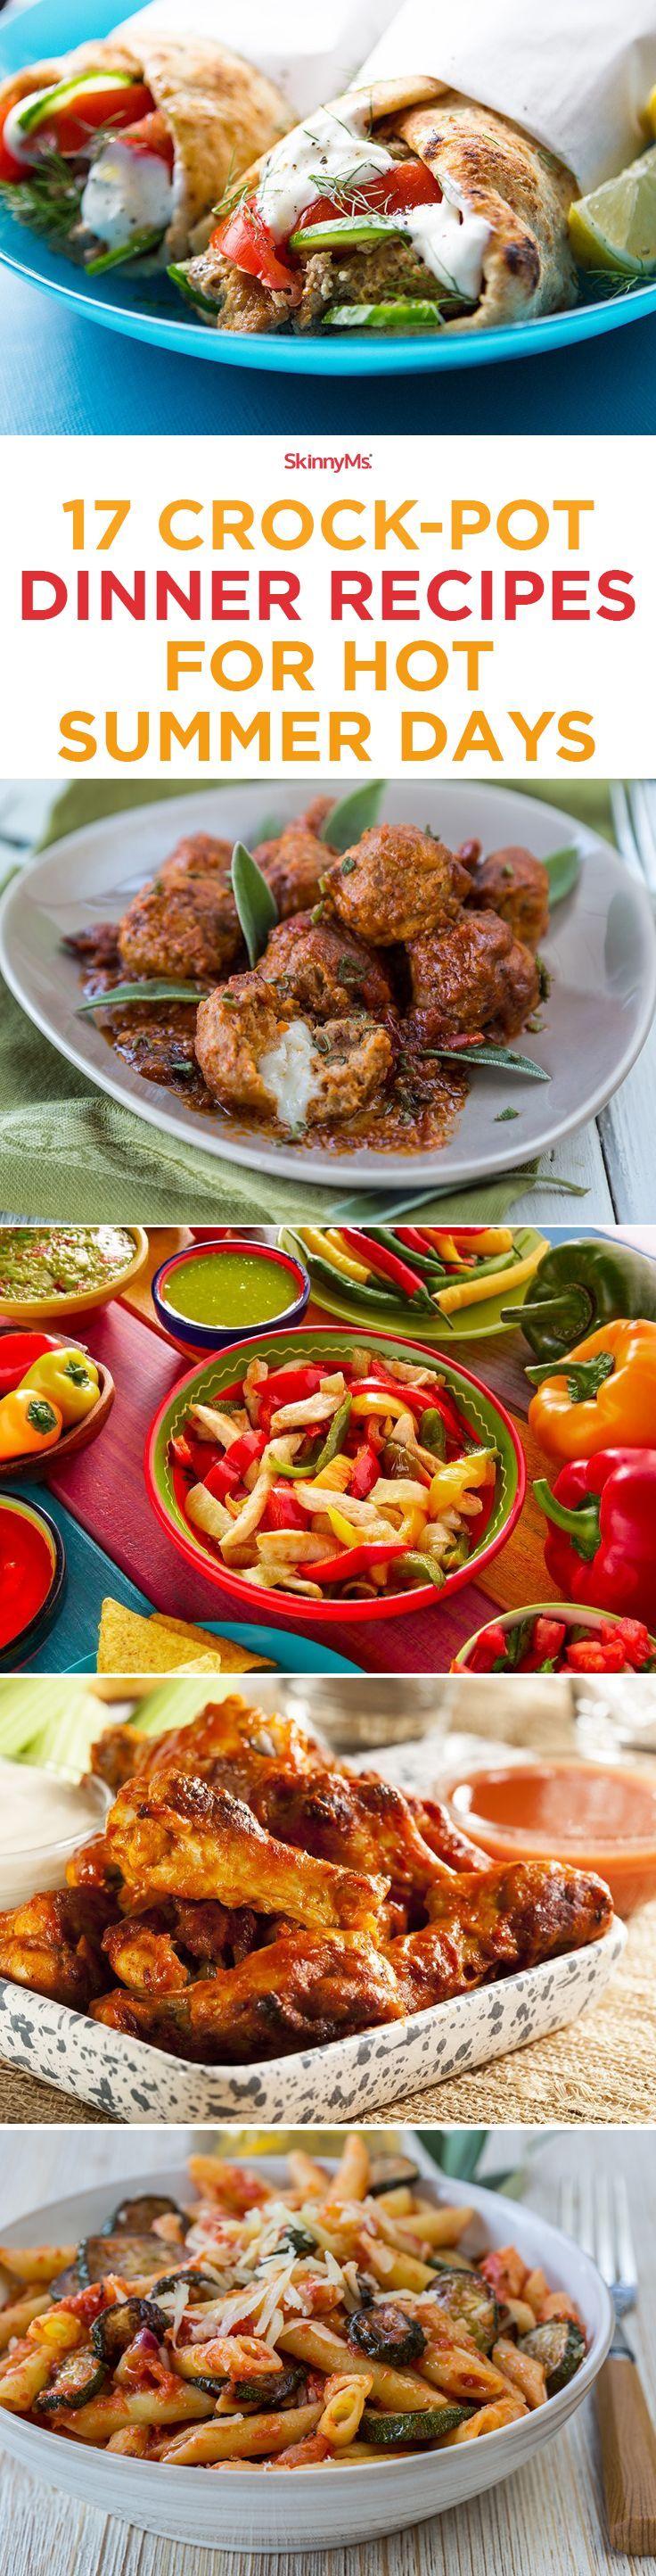 17 Crock-Pot Dinner Recipes for Hot Summer Days!